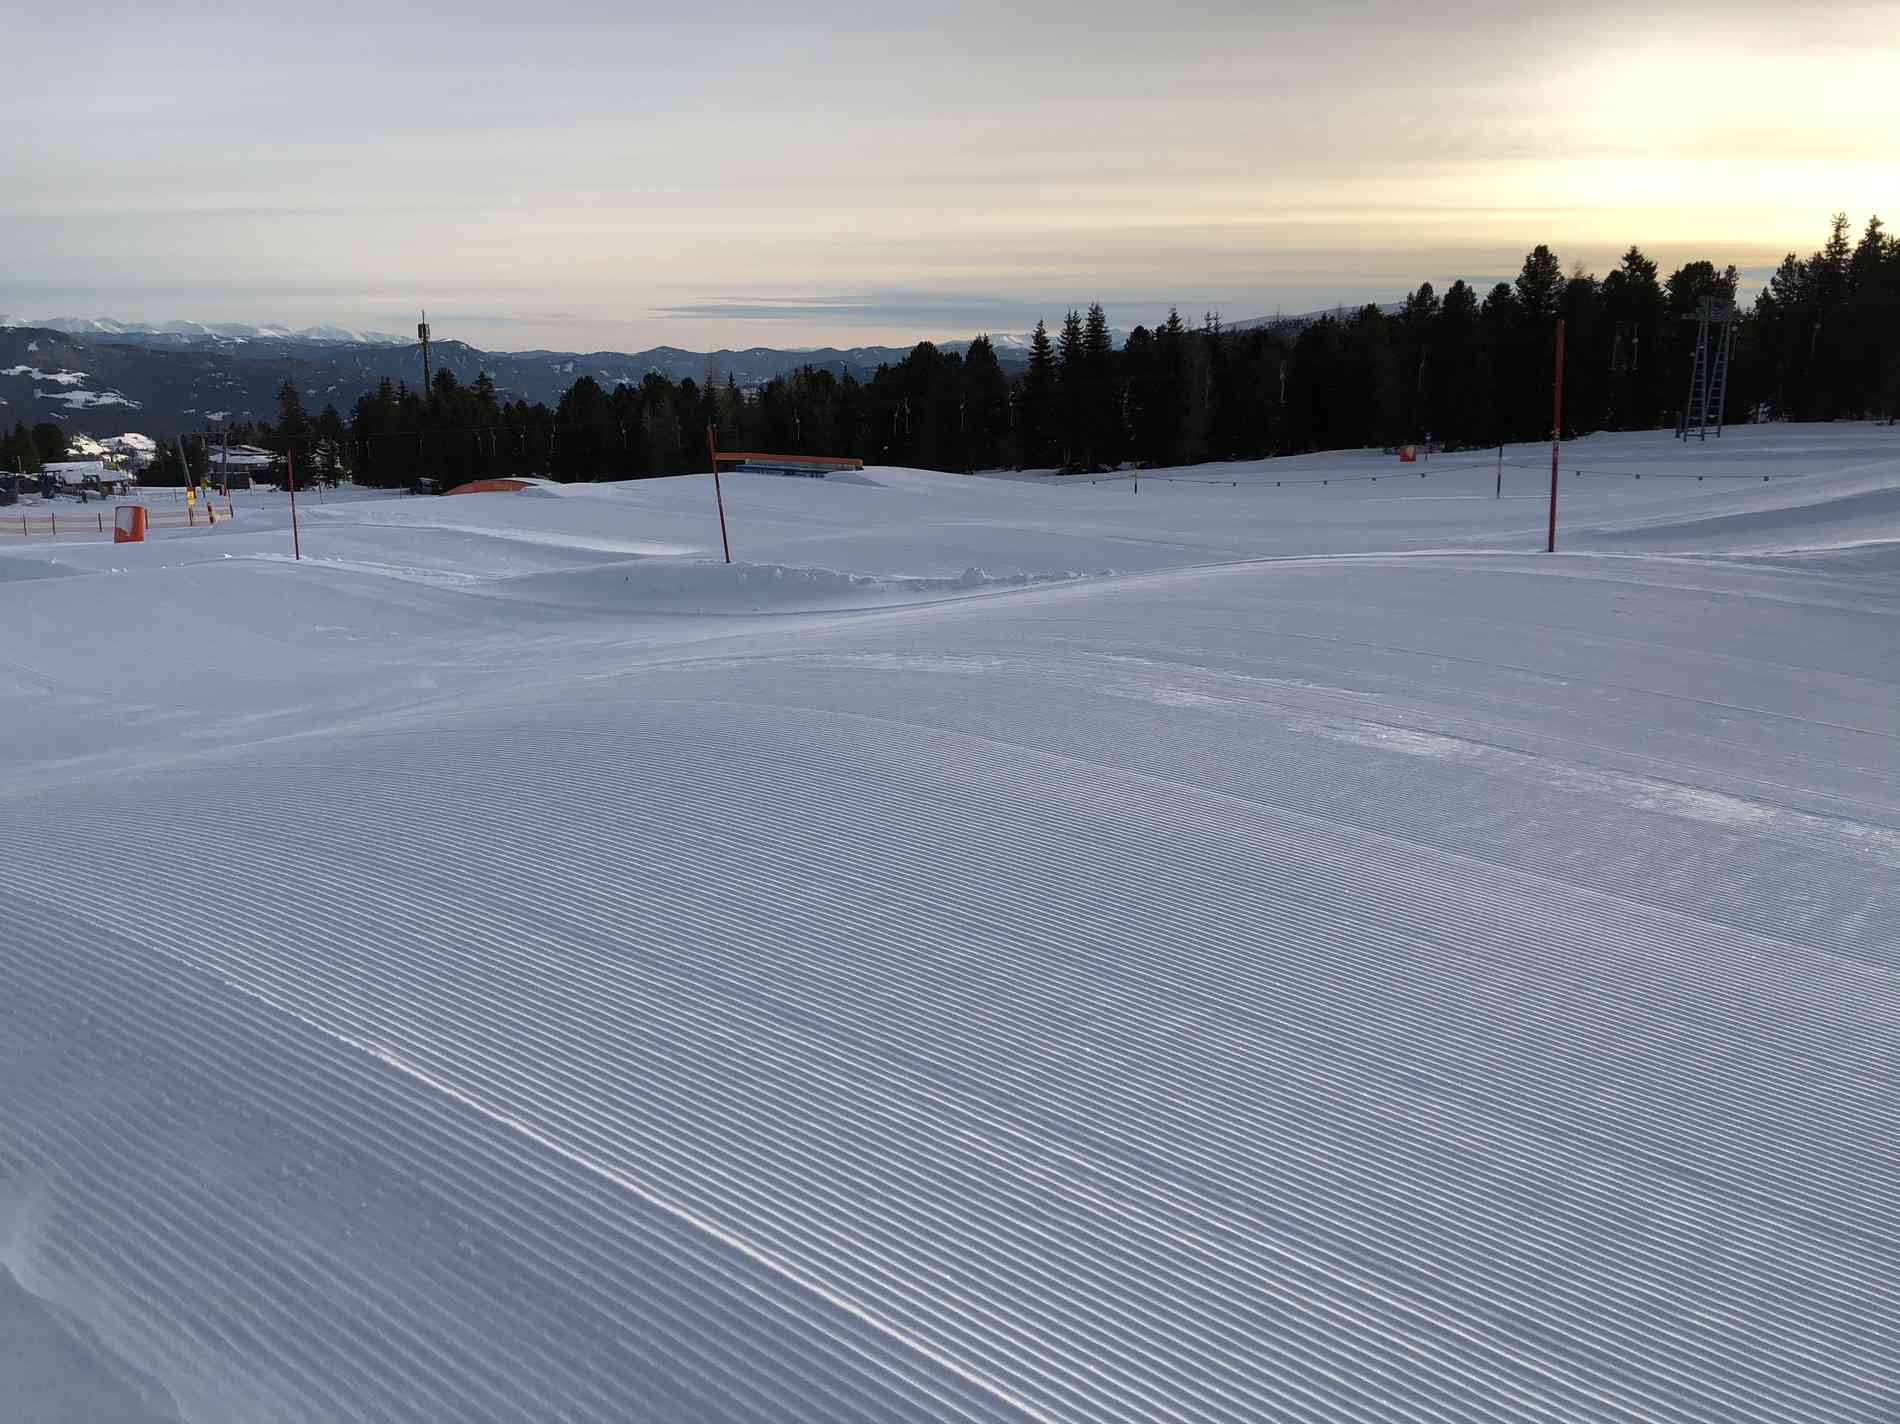 Fun Pipe Area Schnee-Elemente Wave